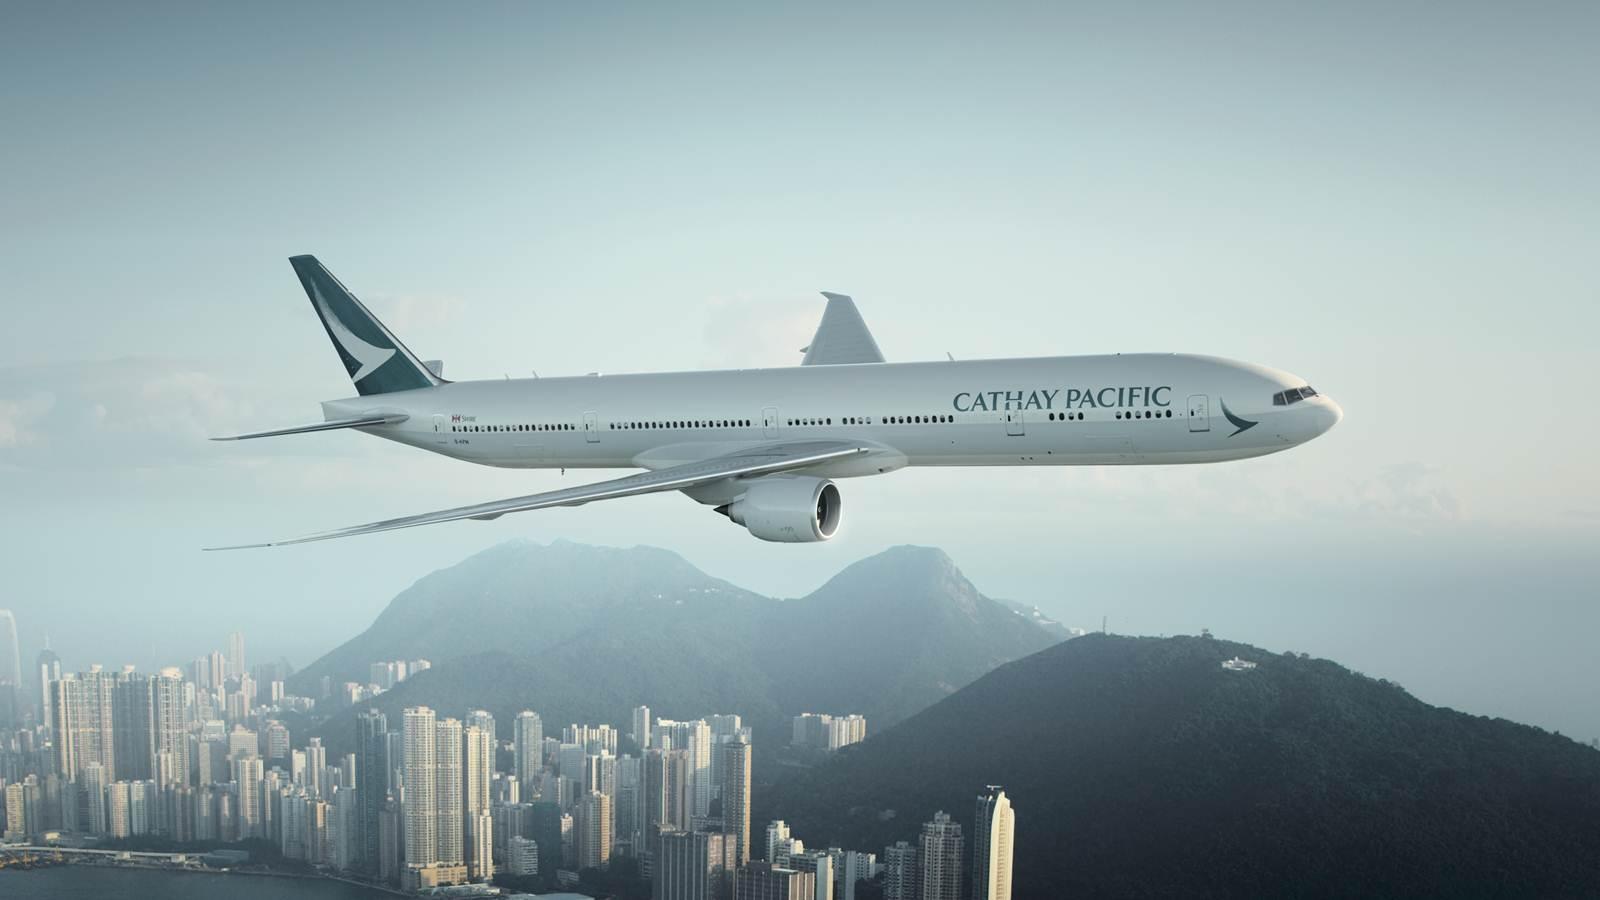 Aeronave da Cathay Pacific a sobrevoar Hong Kong